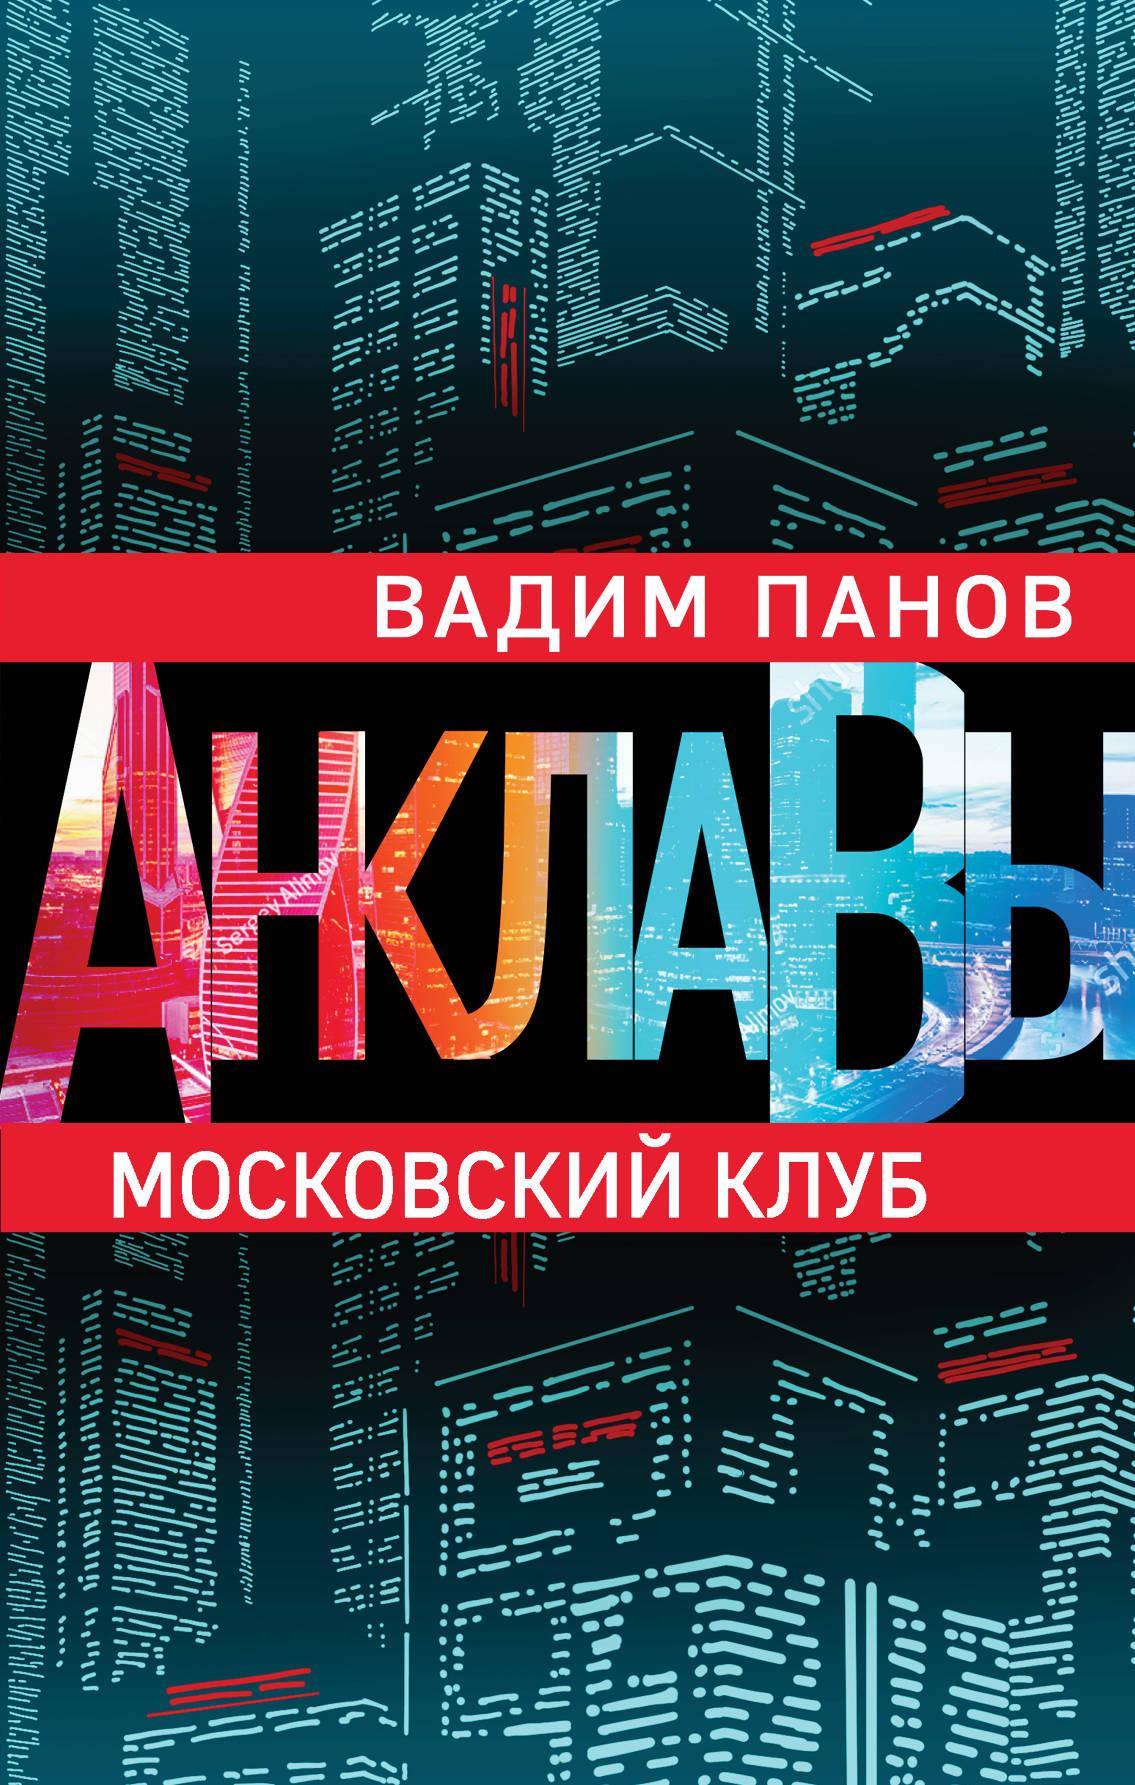 Moskovskij klub